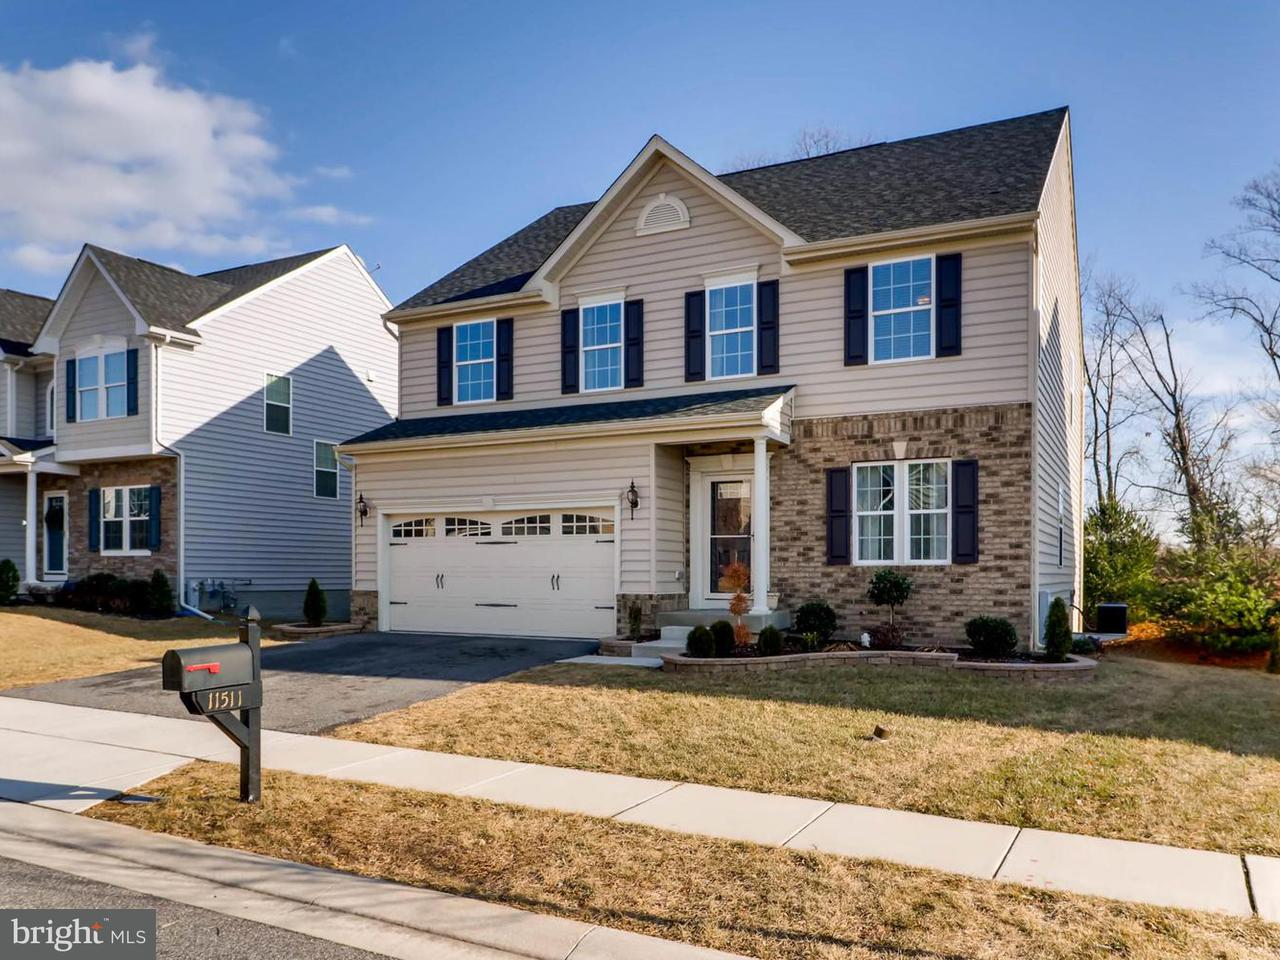 Villa per Vendita alle ore 11511 Ridgedale Drive 11511 Ridgedale Drive White Marsh, Maryland 21162 Stati Uniti